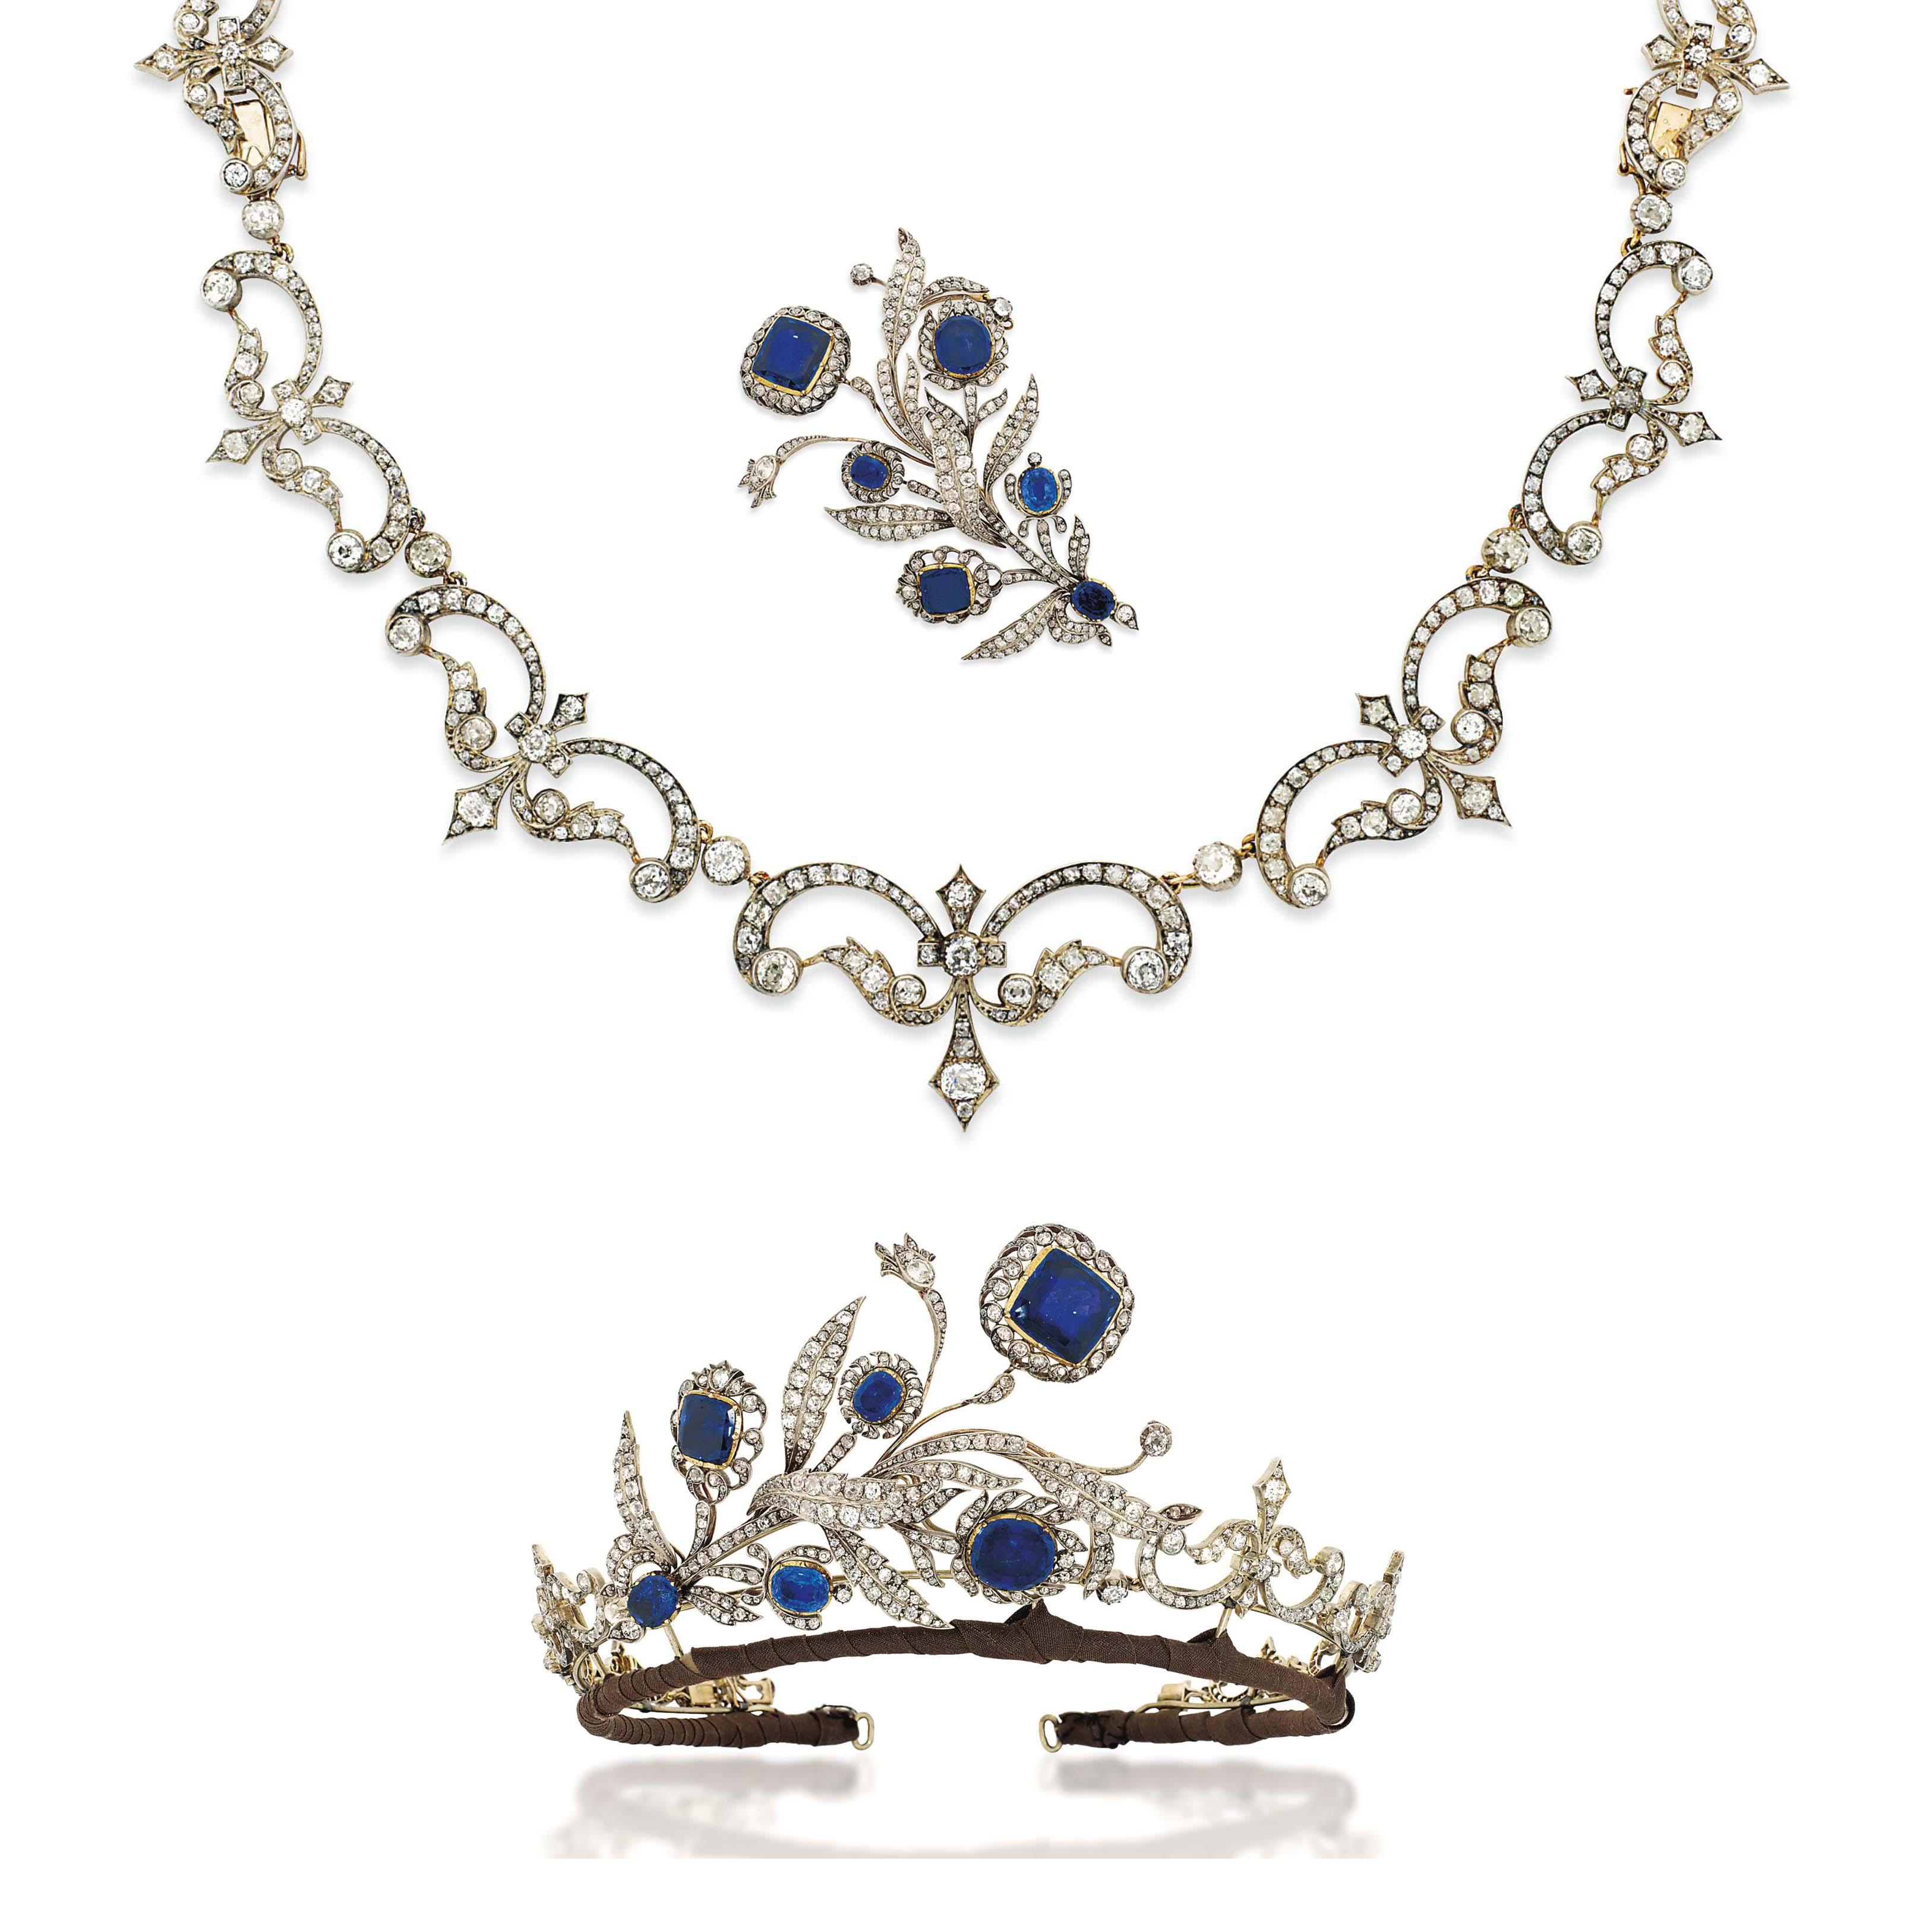 AN ANTIQUE SAPPHIRE AND DIAMOND TIARA / NECKLACE